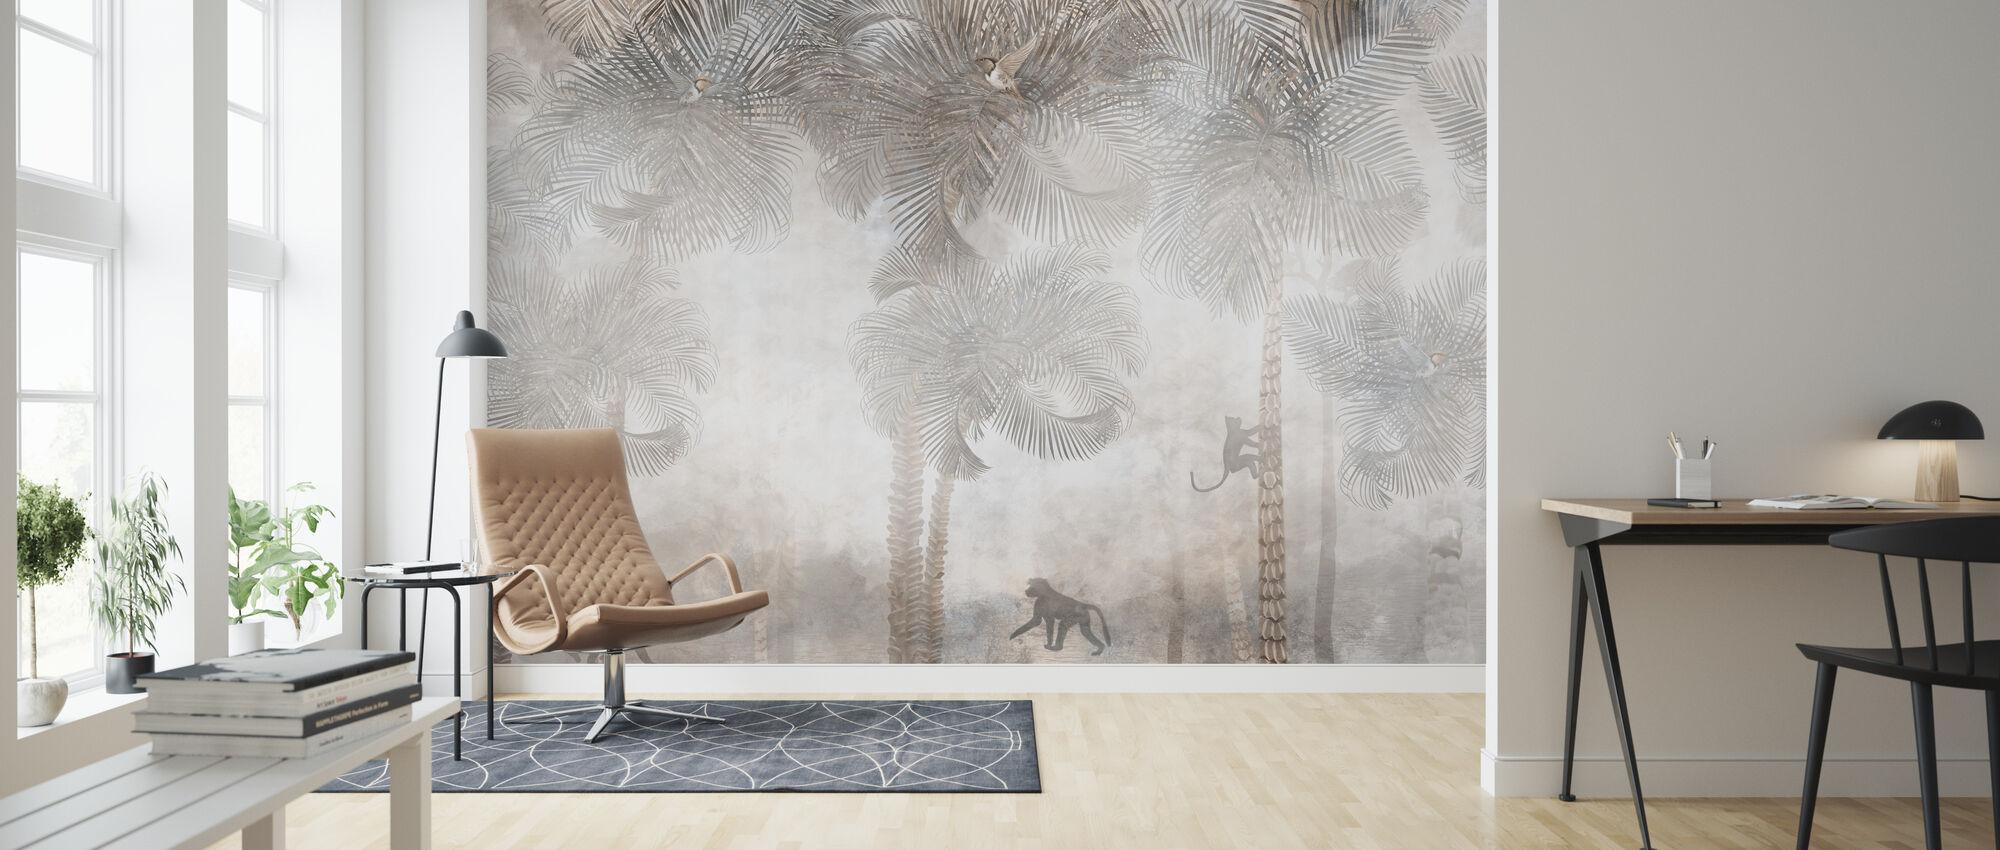 Monkeys Residence IIII - Wallpaper - Living Room